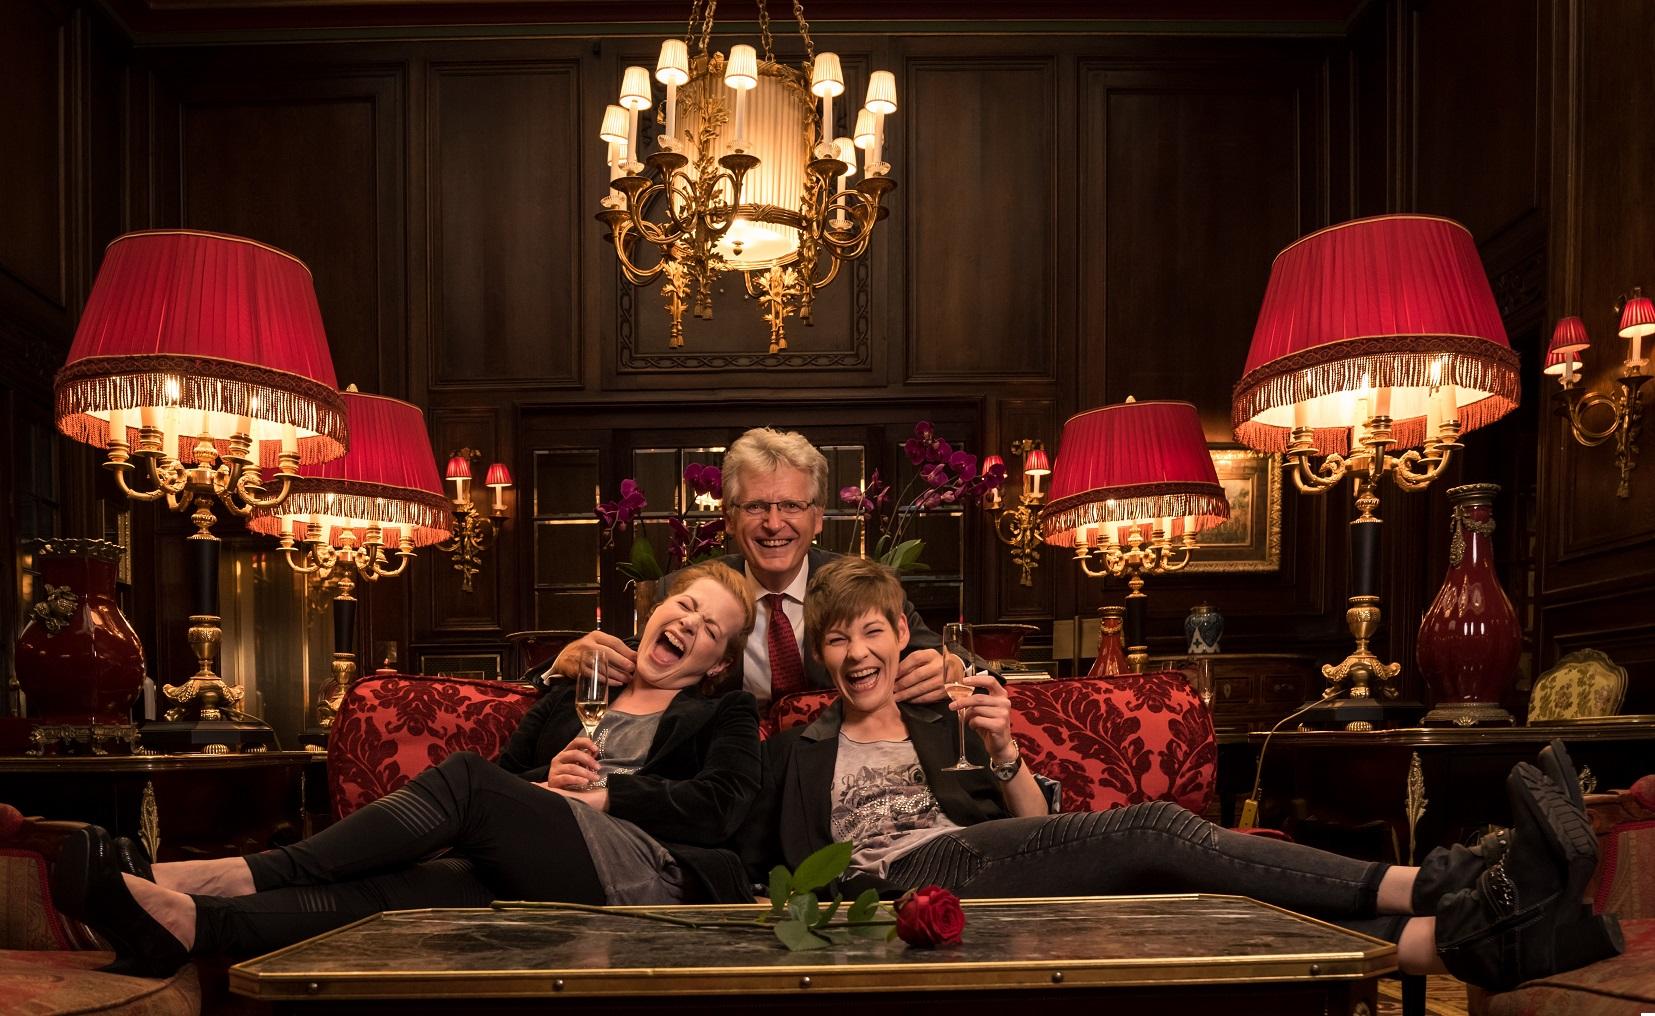 Charmantes mit Gerhard Blaboll, Andrea Schlor und Saskia Fanta